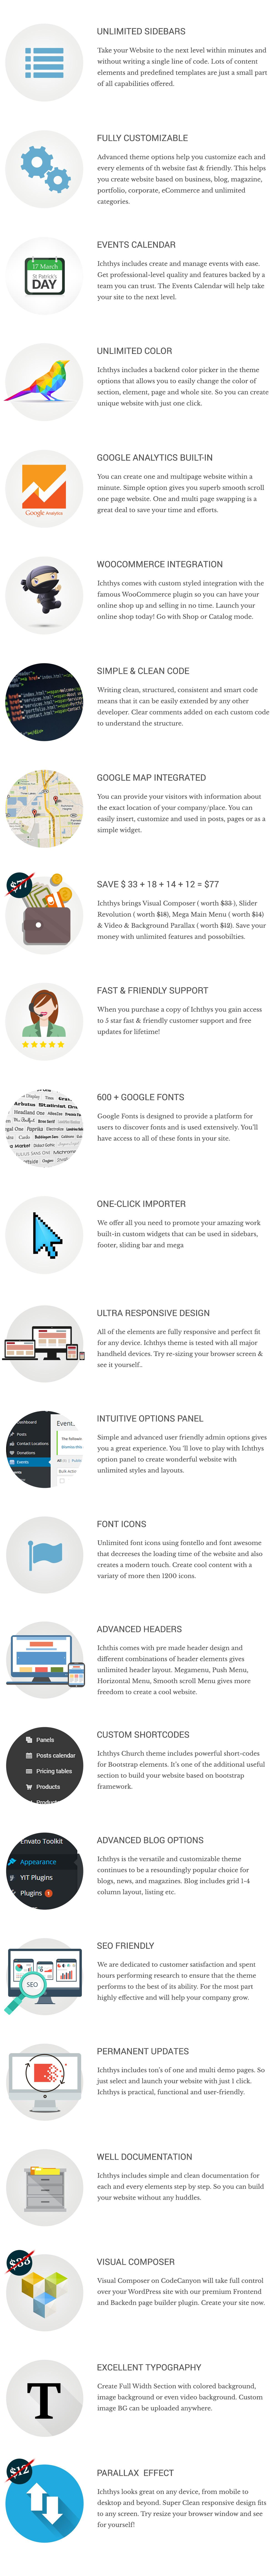 Ichthys - Church WordPress Theme - 9